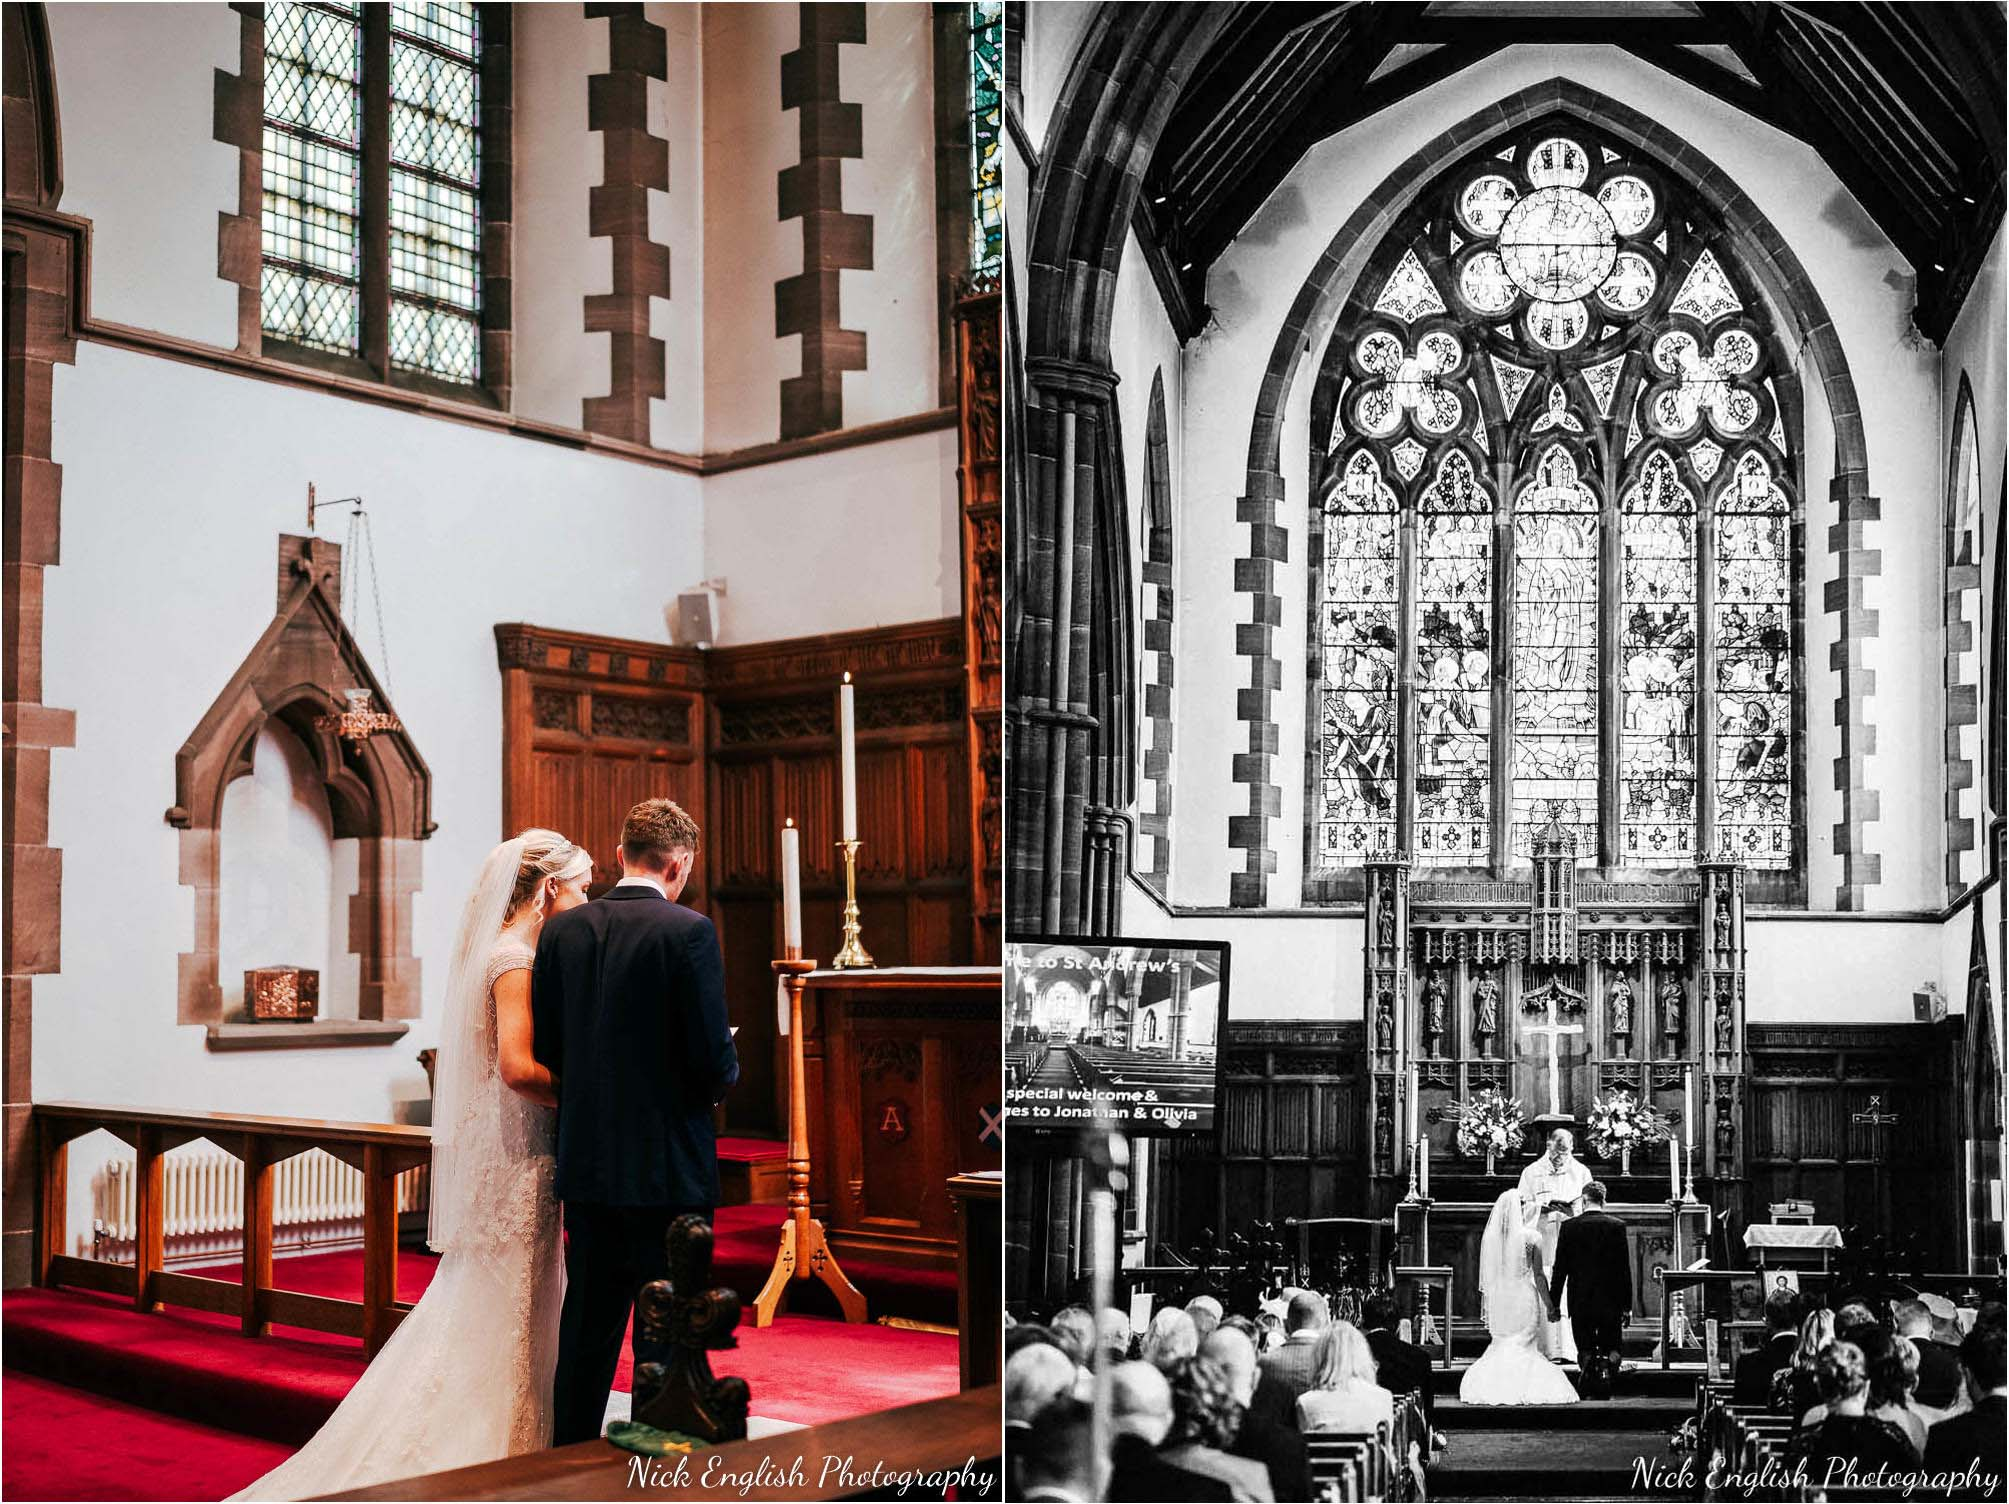 Mitton_Hall_Wedding_Photograph-41 copy.jpg